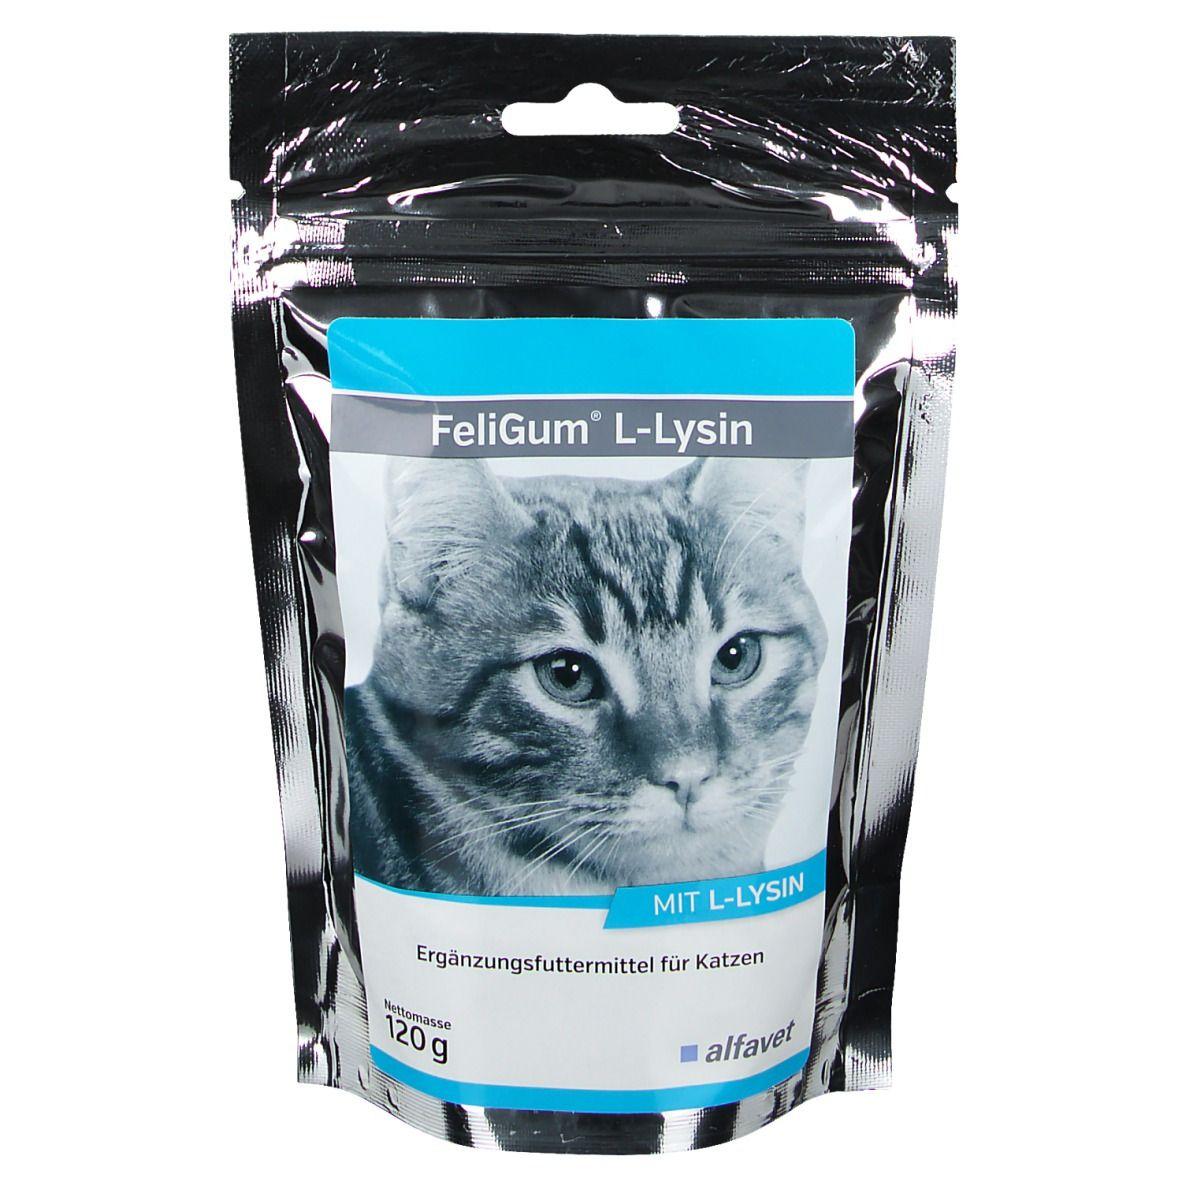 FeliGum® L-Lysin